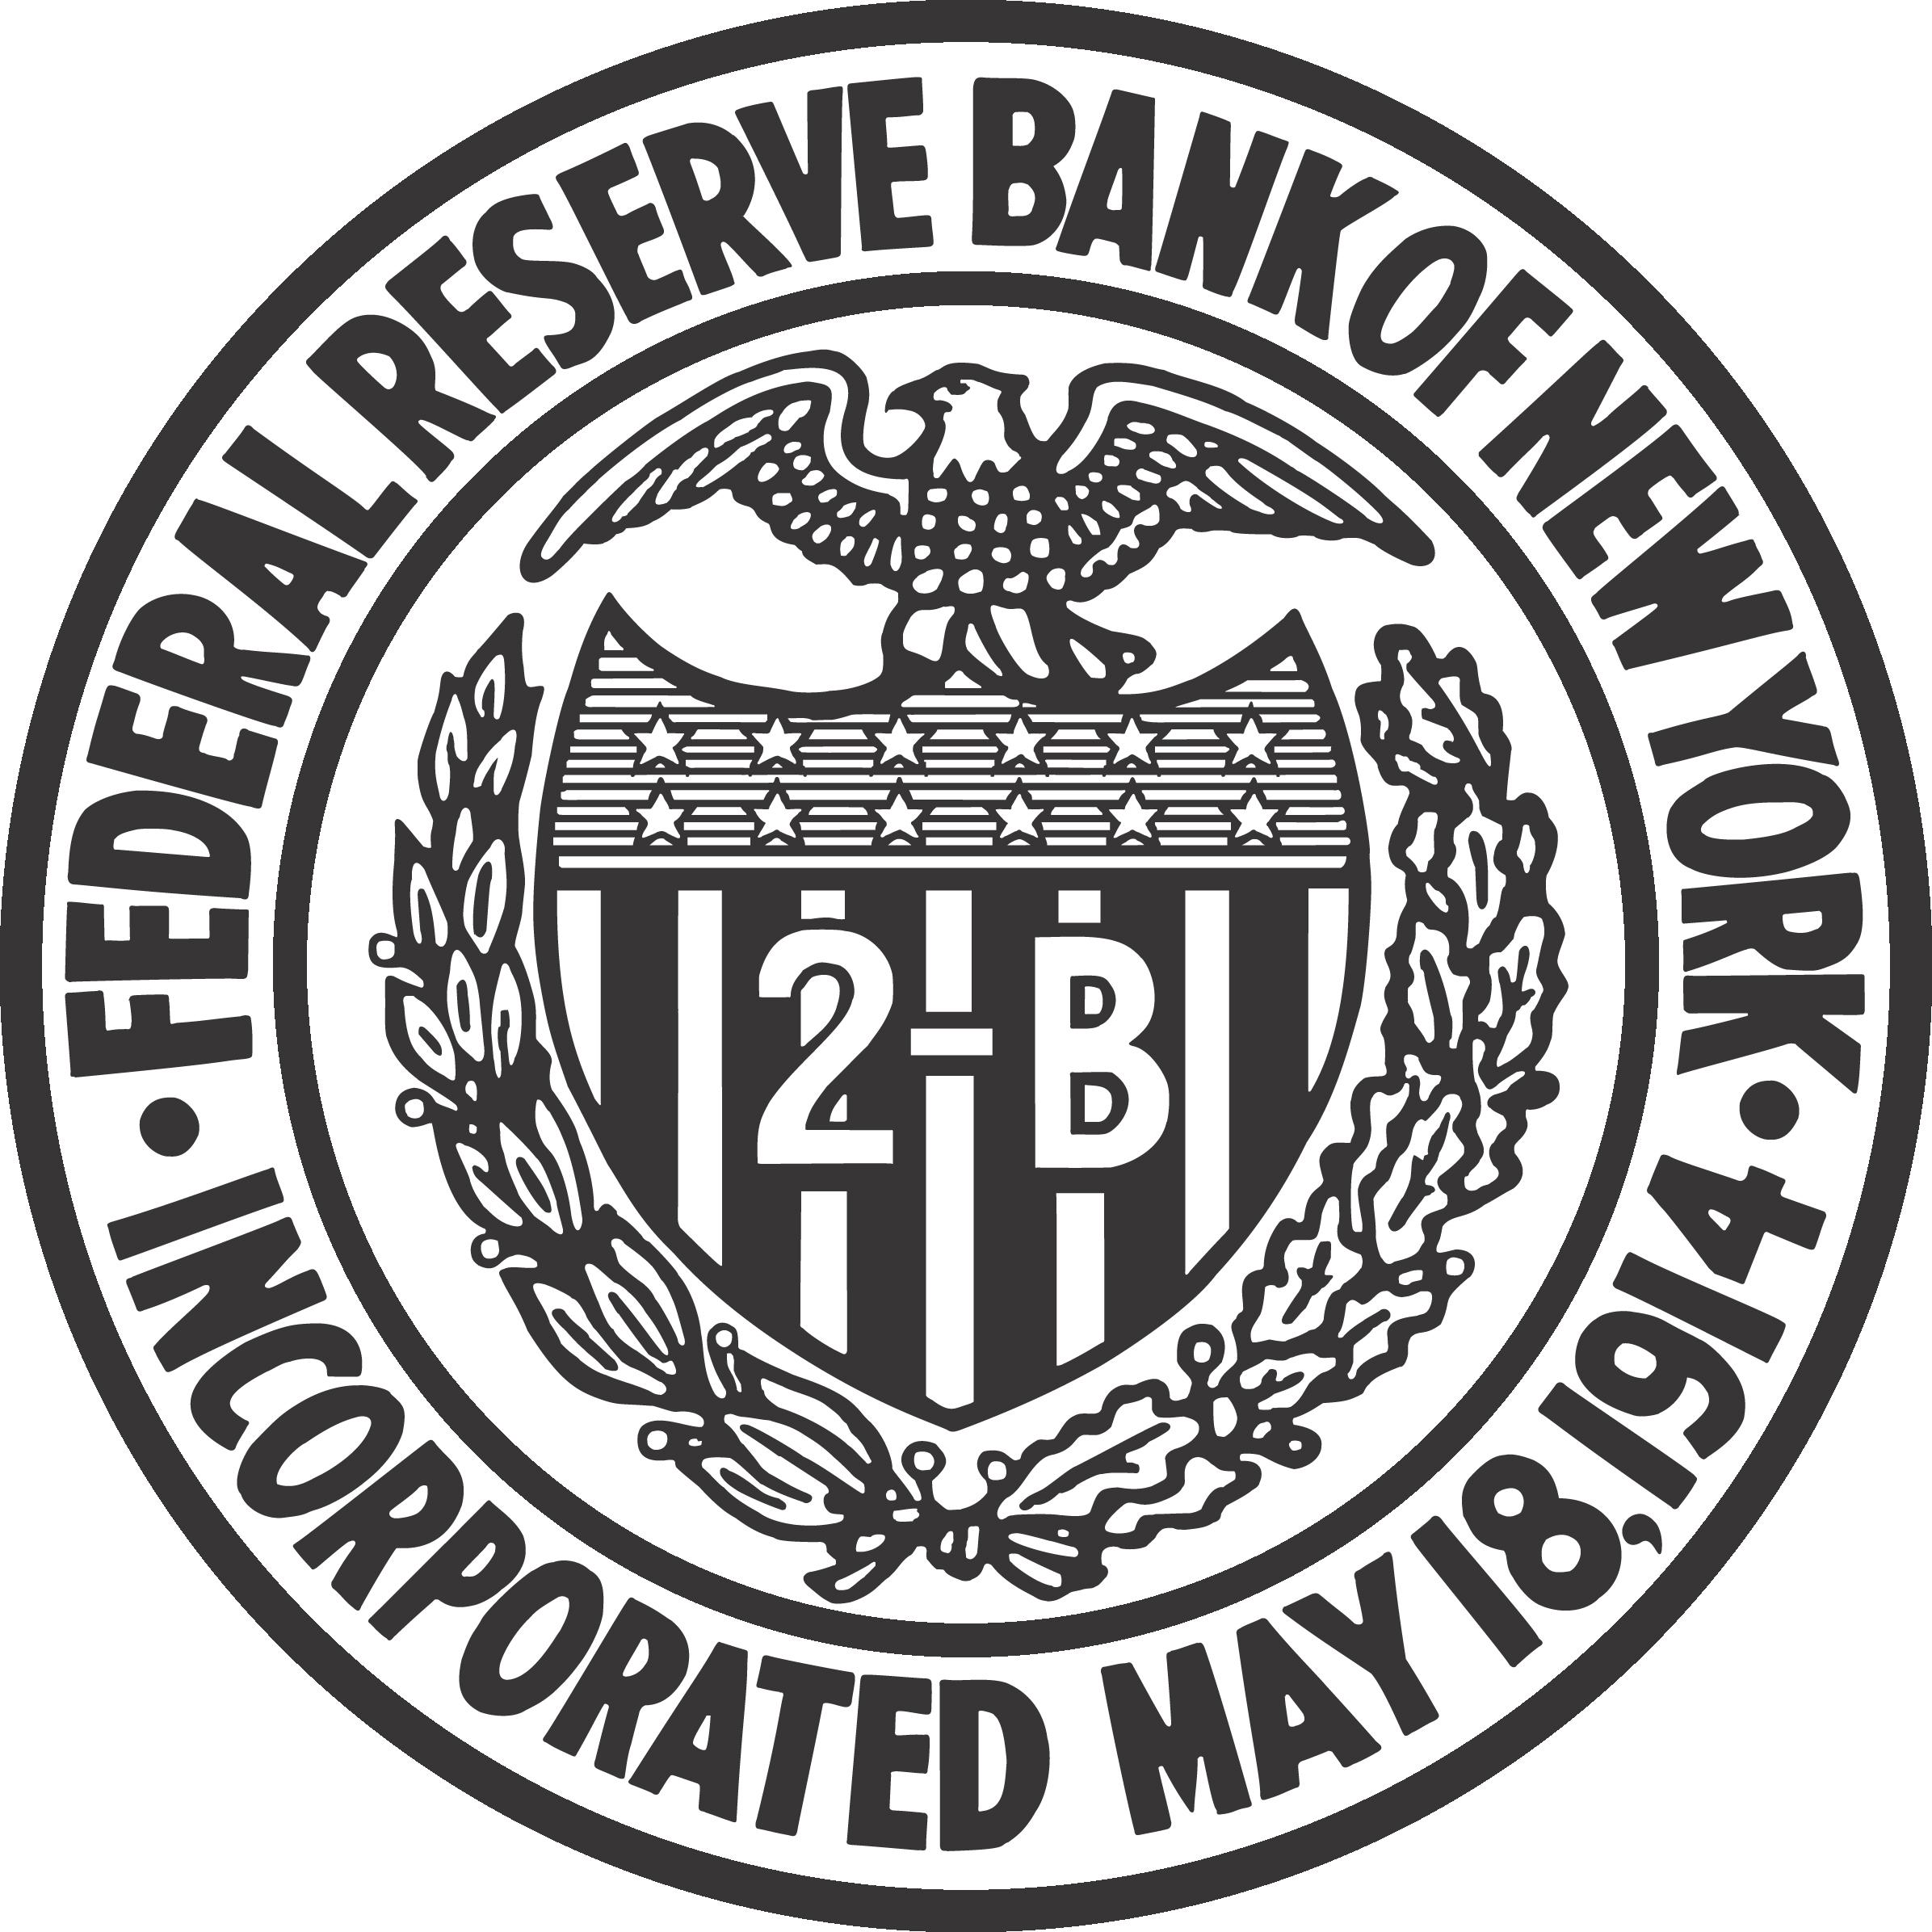 Federal-Reserve-Bank-of-New-York-1-1-1.jpg